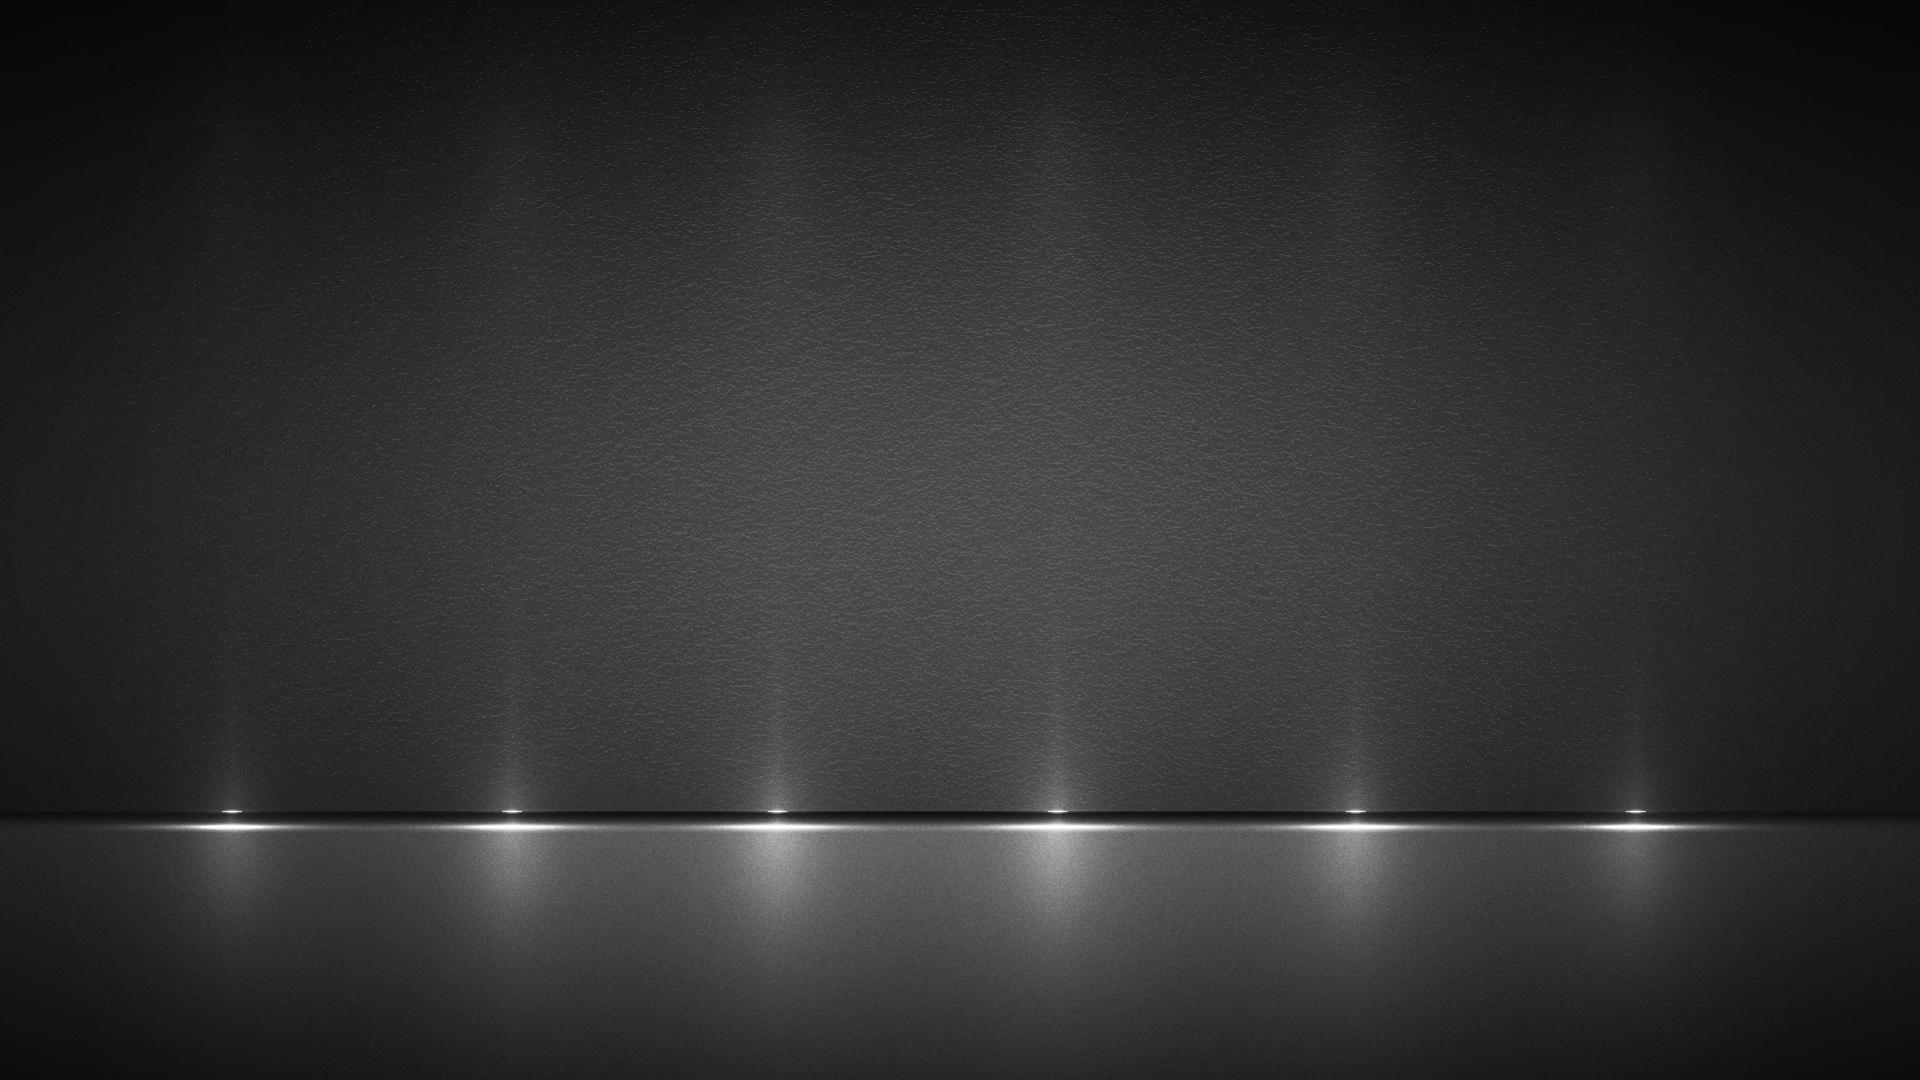 Black White and Gray Wallpaper - WallpaperSafari